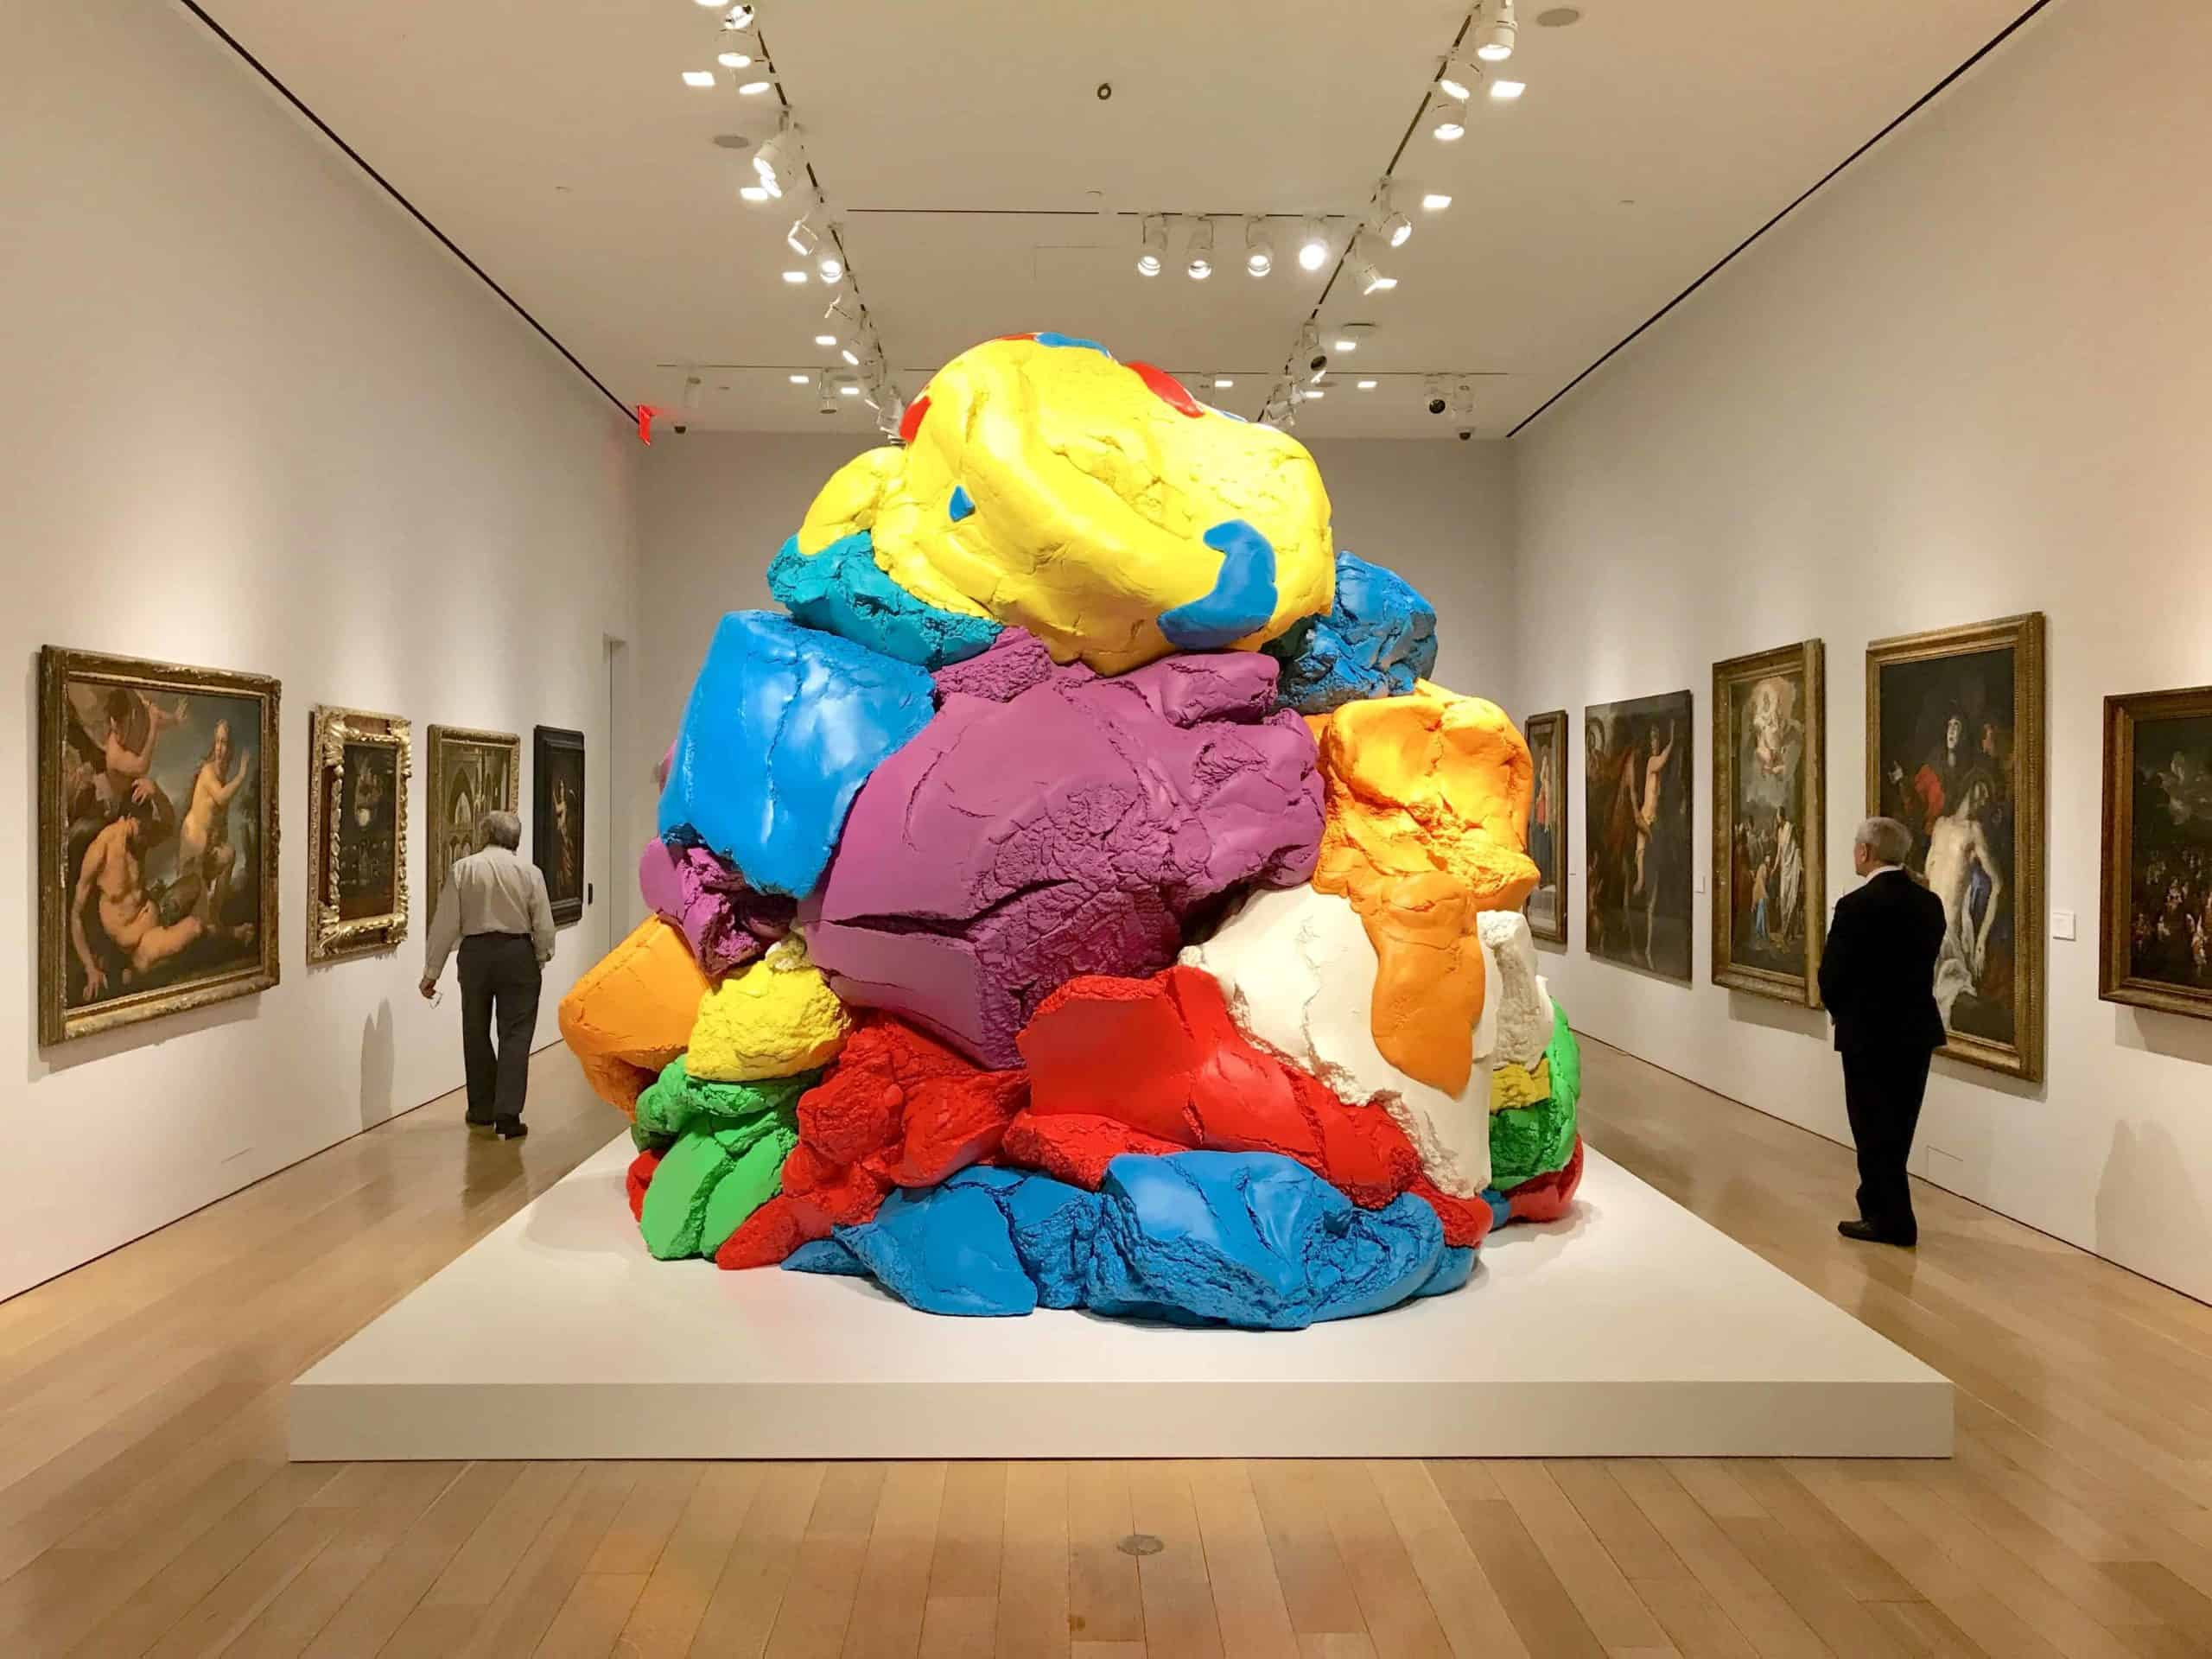 Jeff Koons,Play-Doh, 1994-2014